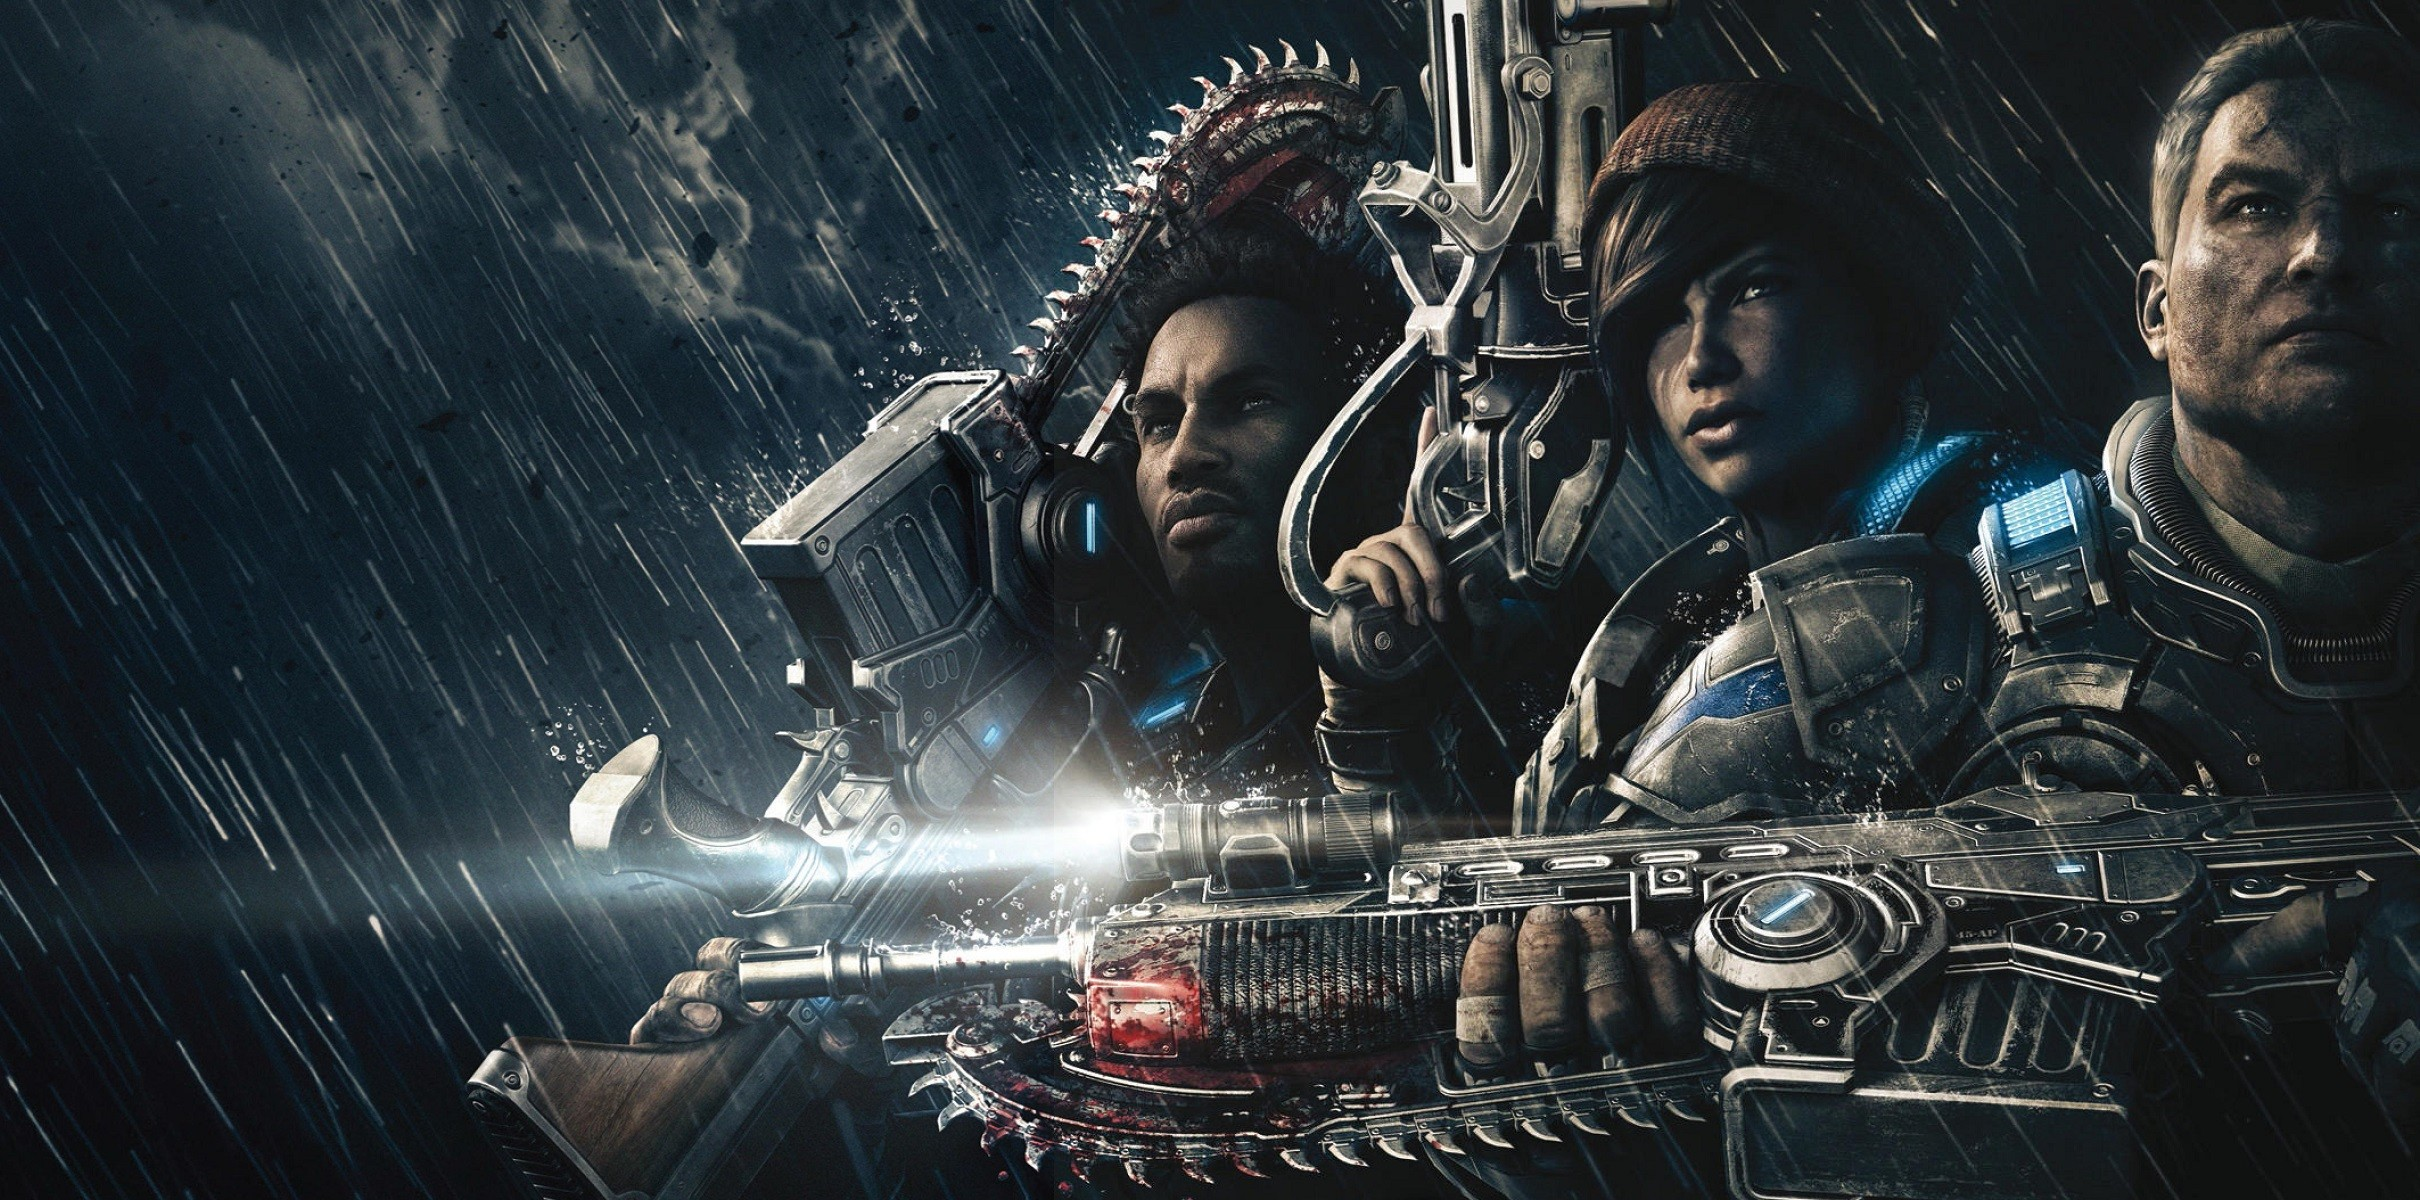 Gears Of War 4 2016 Video Game 4k Hd Desktop Wallpaper For: Gears Of War 4 Wallpaper ·① Download Free Amazing